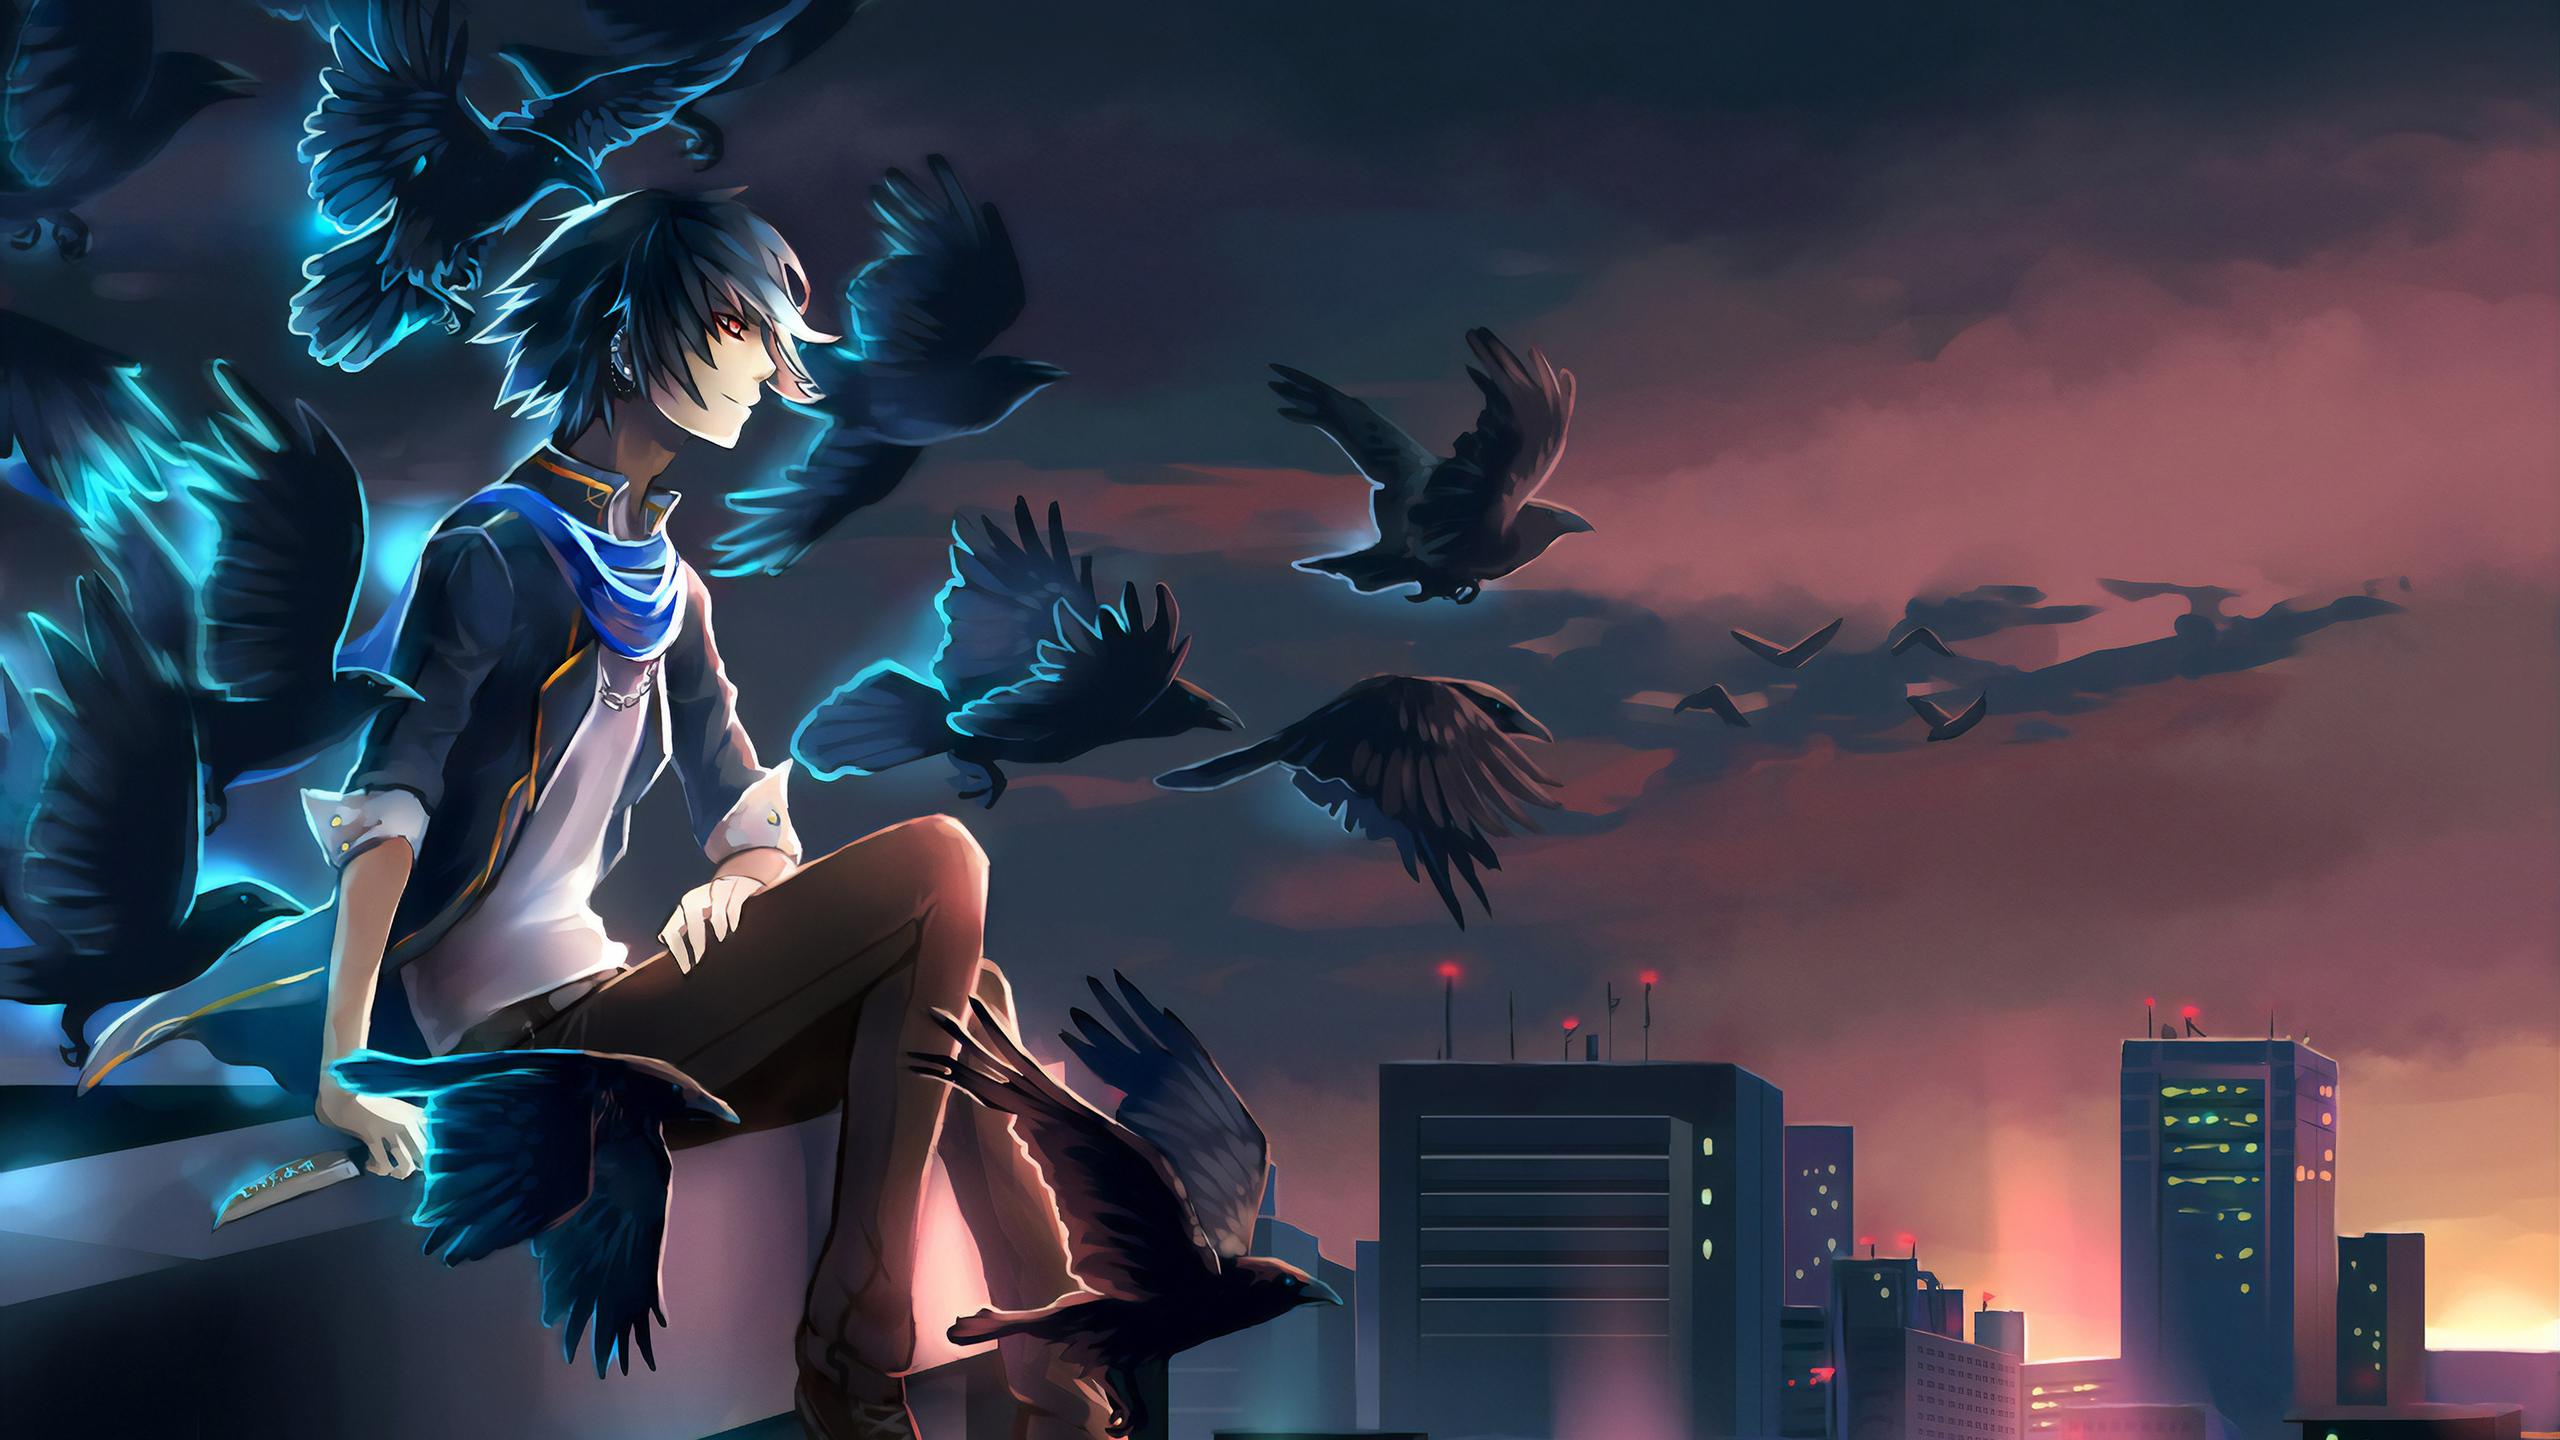 2560x1440 Night Lights Anime 1440P Resolution HD 4k ...